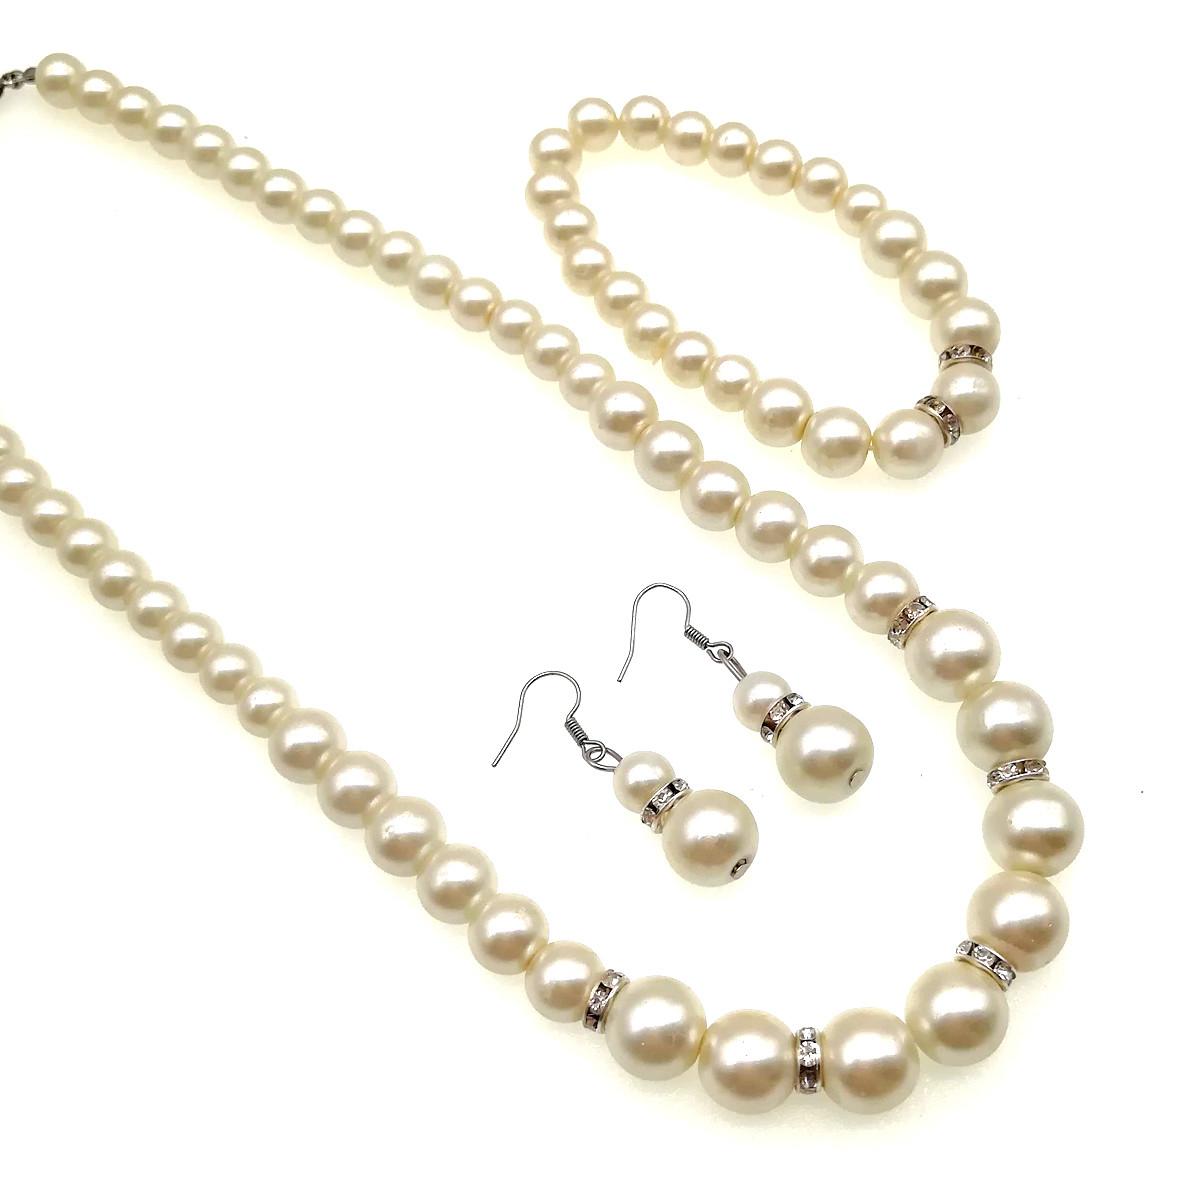 Комплект SONATA, майорки кремово-белого цвета, 72882       (1)